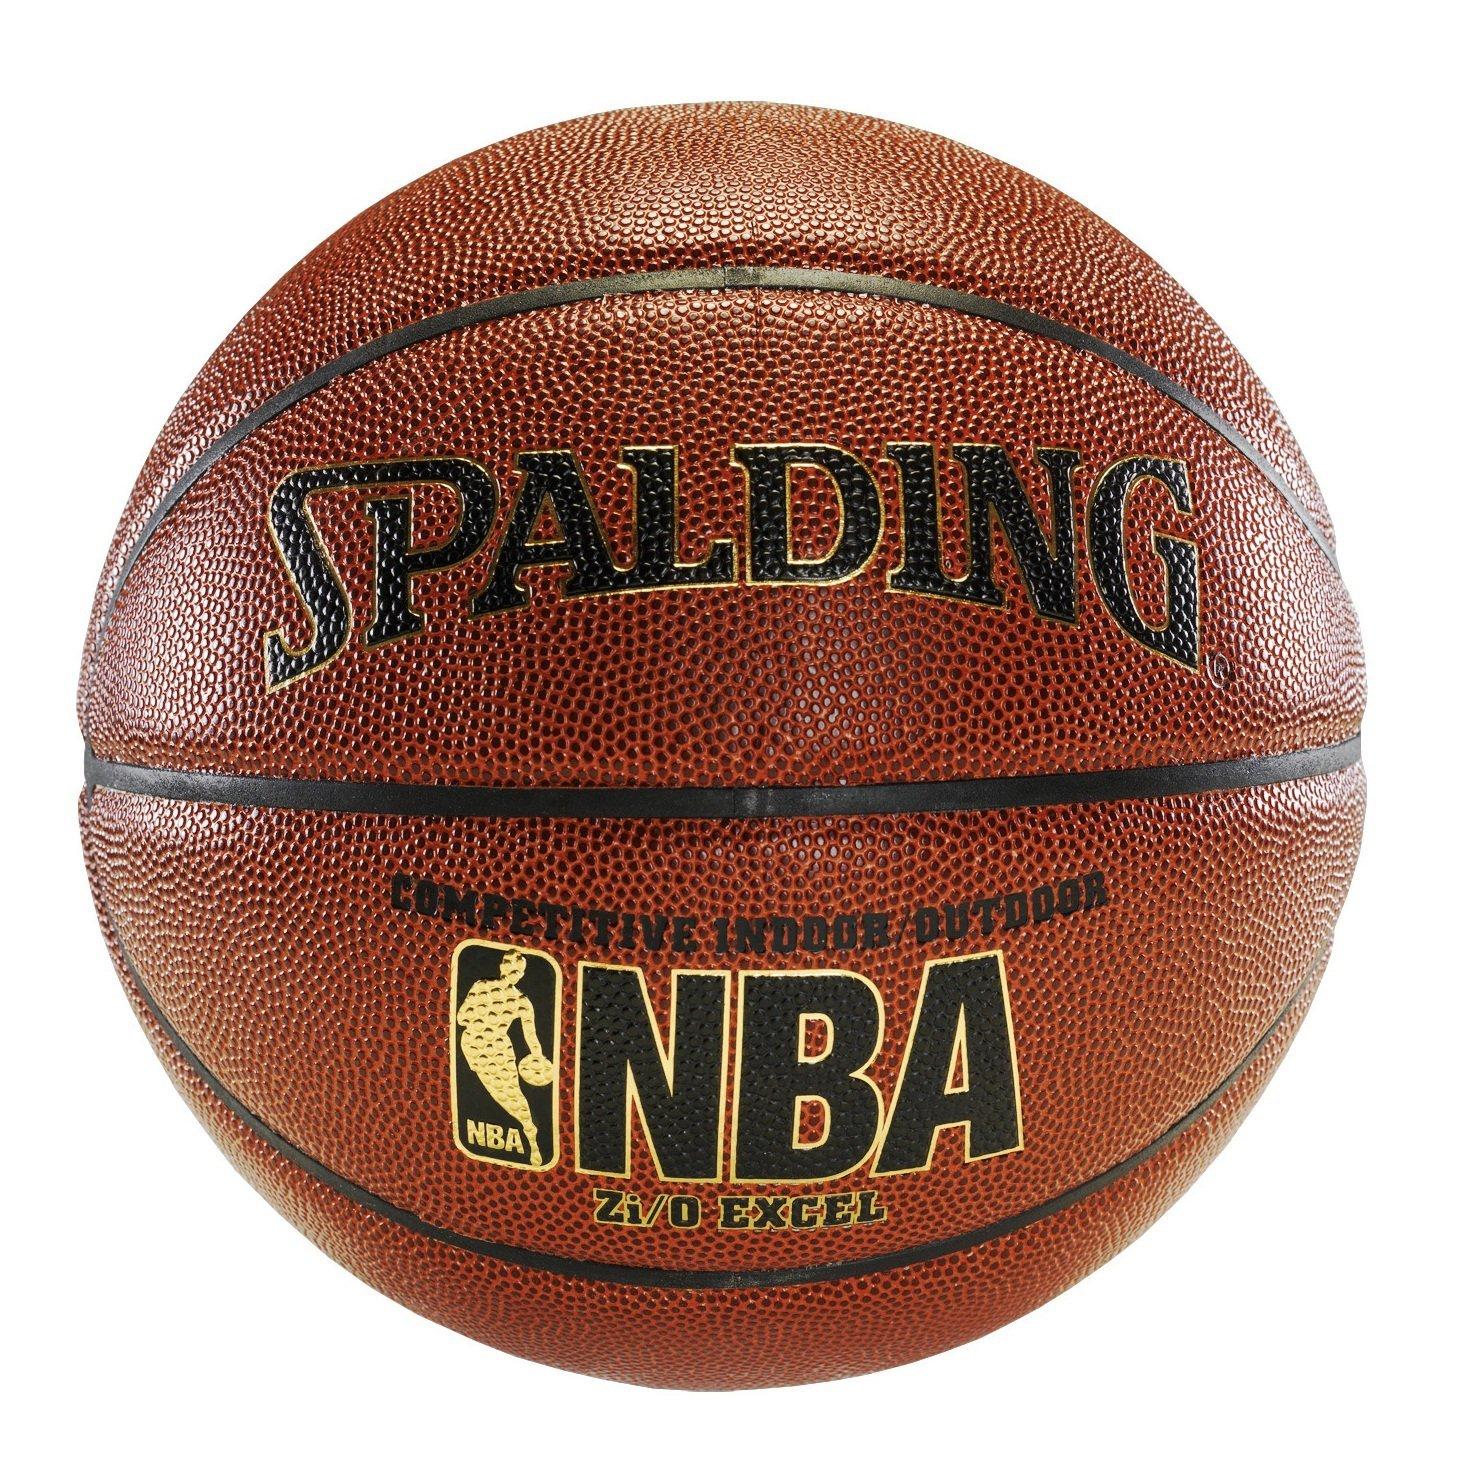 "Spalding NBA Zi/O Excel Basketball Unisex braun Official Size 7 (29.5"") 10205"